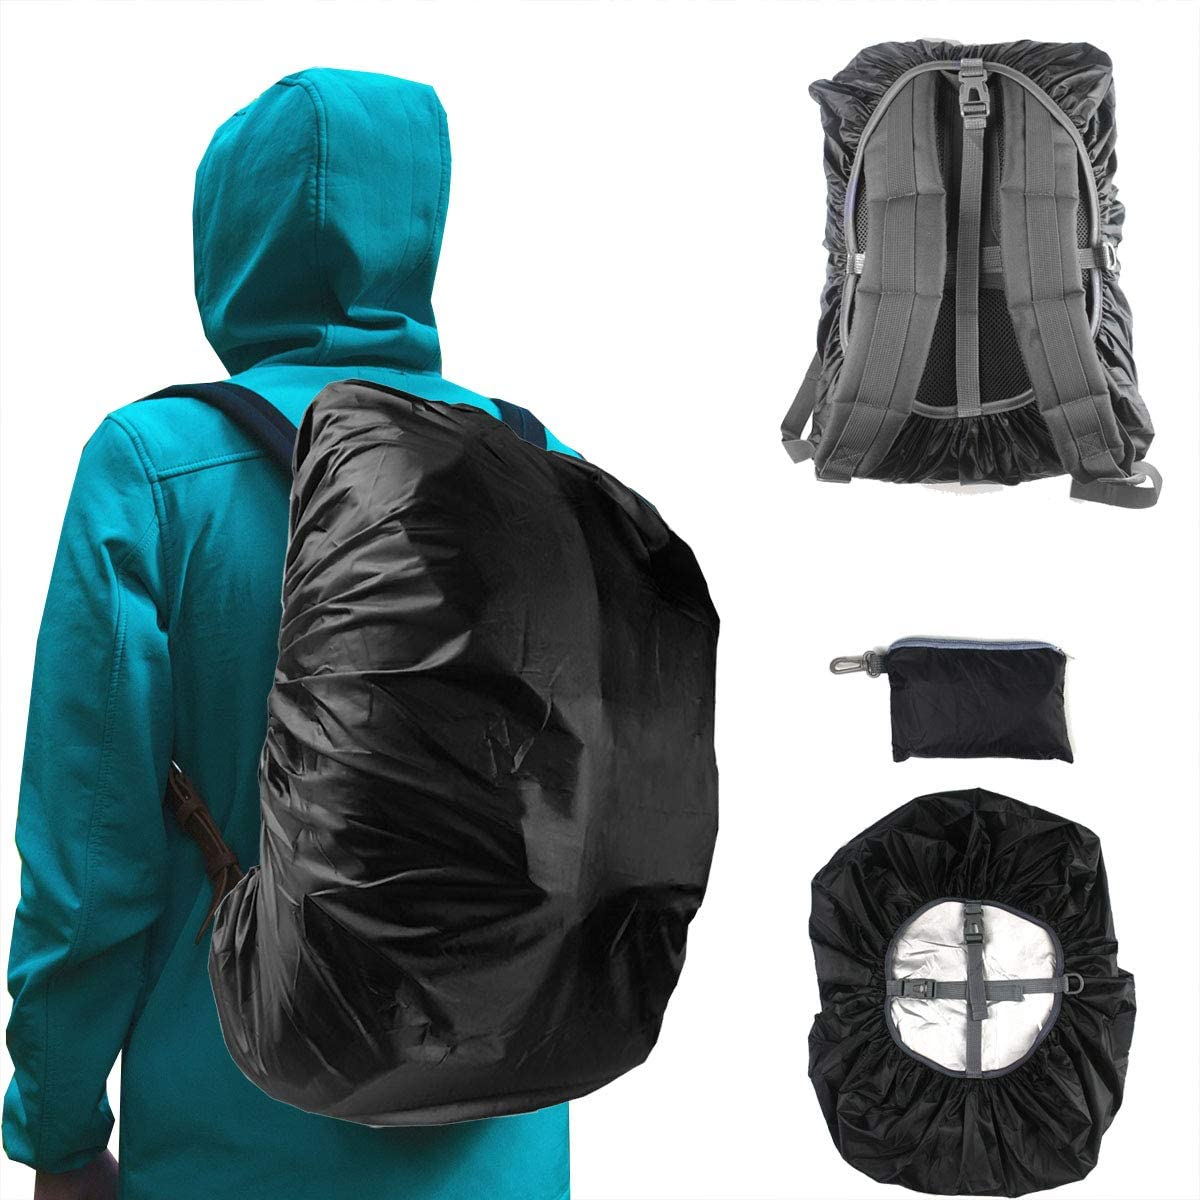 Frelaxy Waterproof Backpack Rain Cover, 2020 Upgraded Triple Waterproofing, Antislip Cross Buckle Strap, Ultralight Compact Portable, for Hiking, Camping, Biking, Outdoor, Traveling